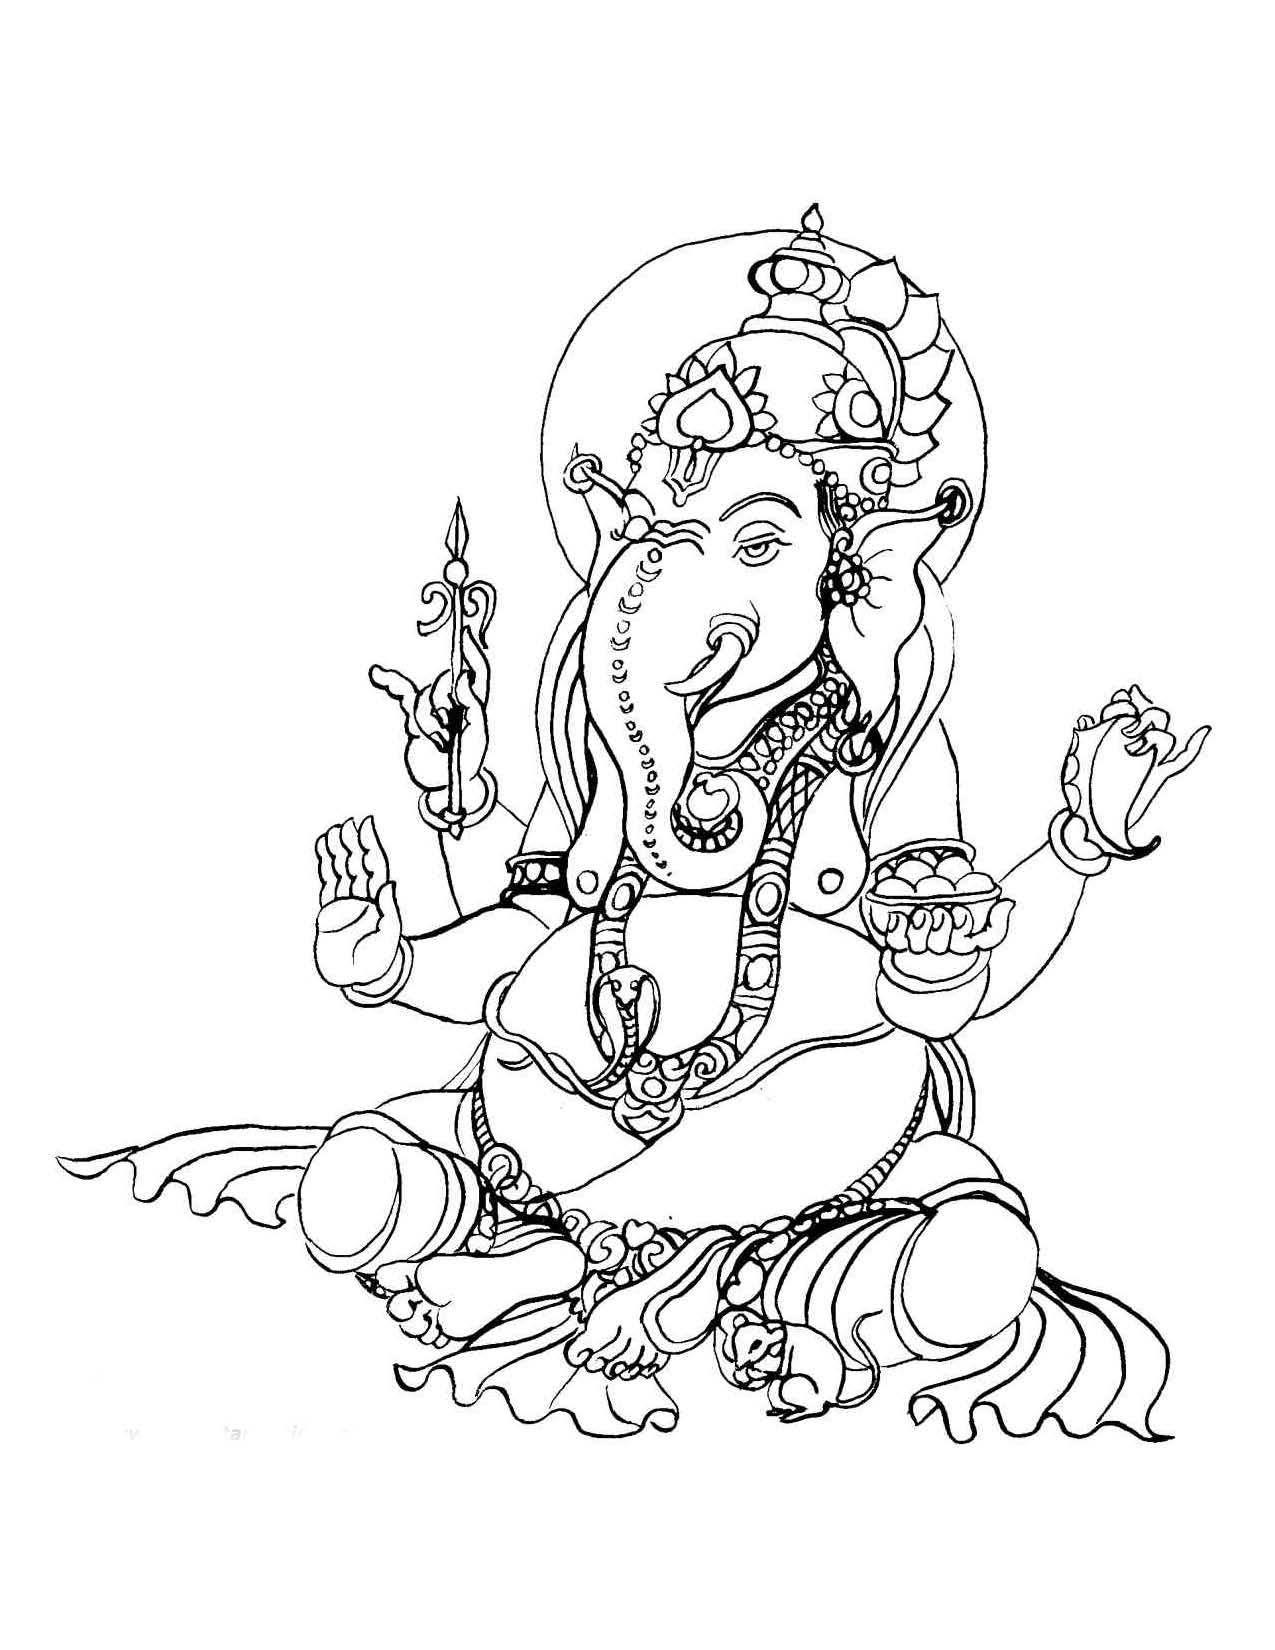 Ganesh Colour Id 59469 Uncategorized Yoand Biz Kleurboek Kleurplaten Illustraties